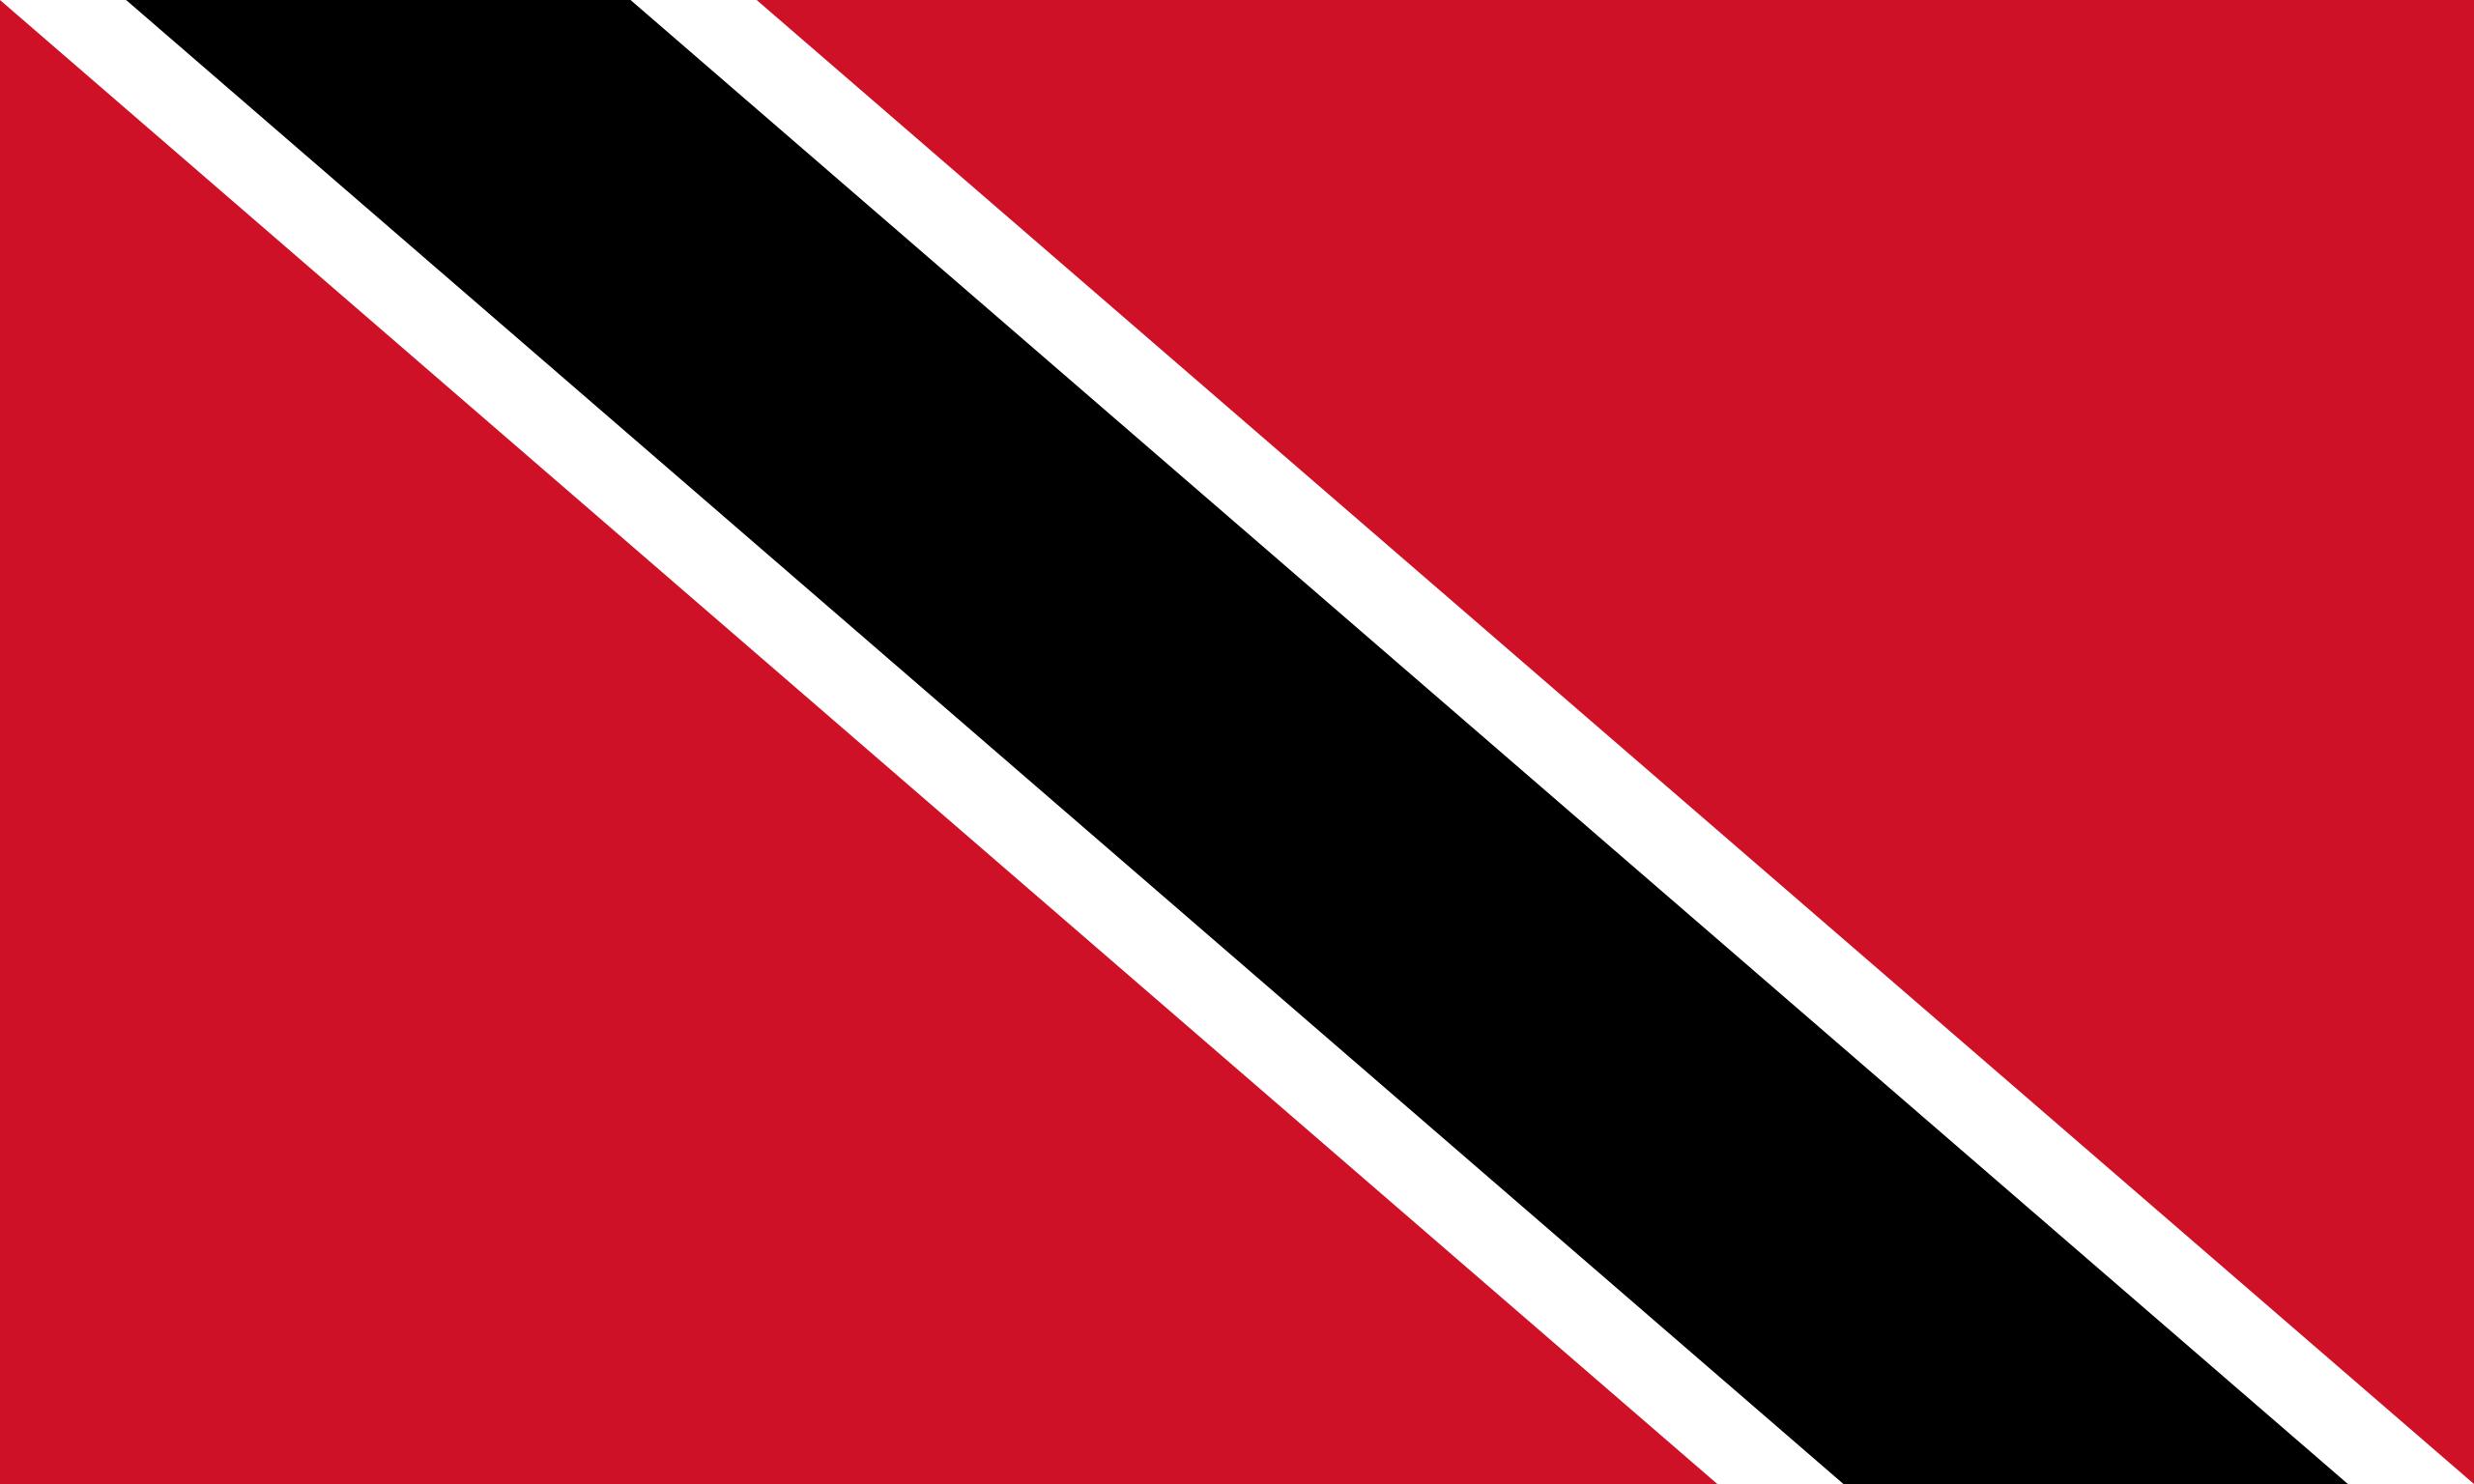 trinidad y tobago, Land, Emblem, Logo, Symbol - Wallpaper HD - Prof.-falken.com